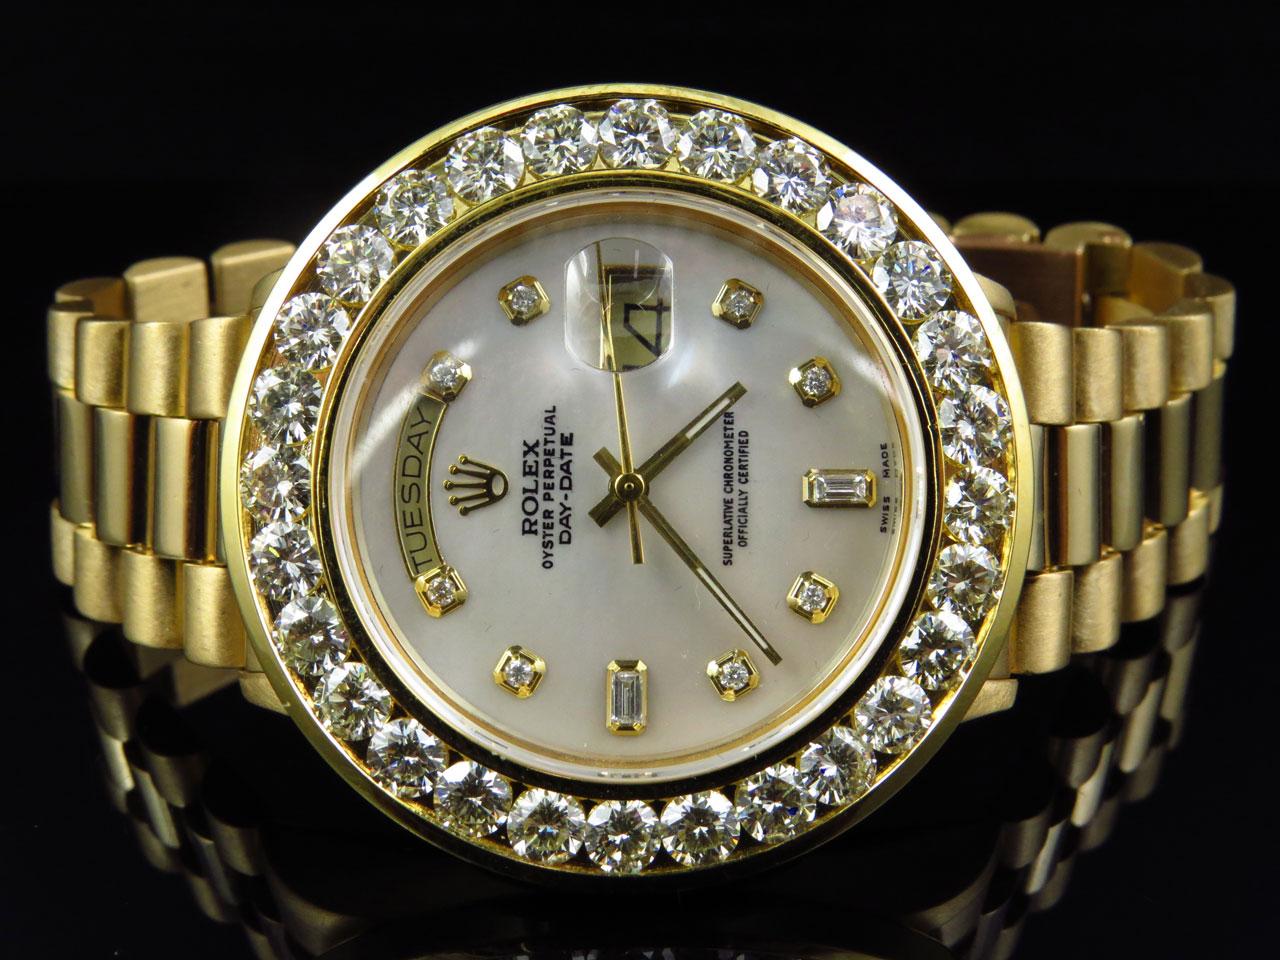 18k yellow gold mens large diamond solid rolex president day date 18k yellow gold mens large diamond solid rolex president day date diamond watch